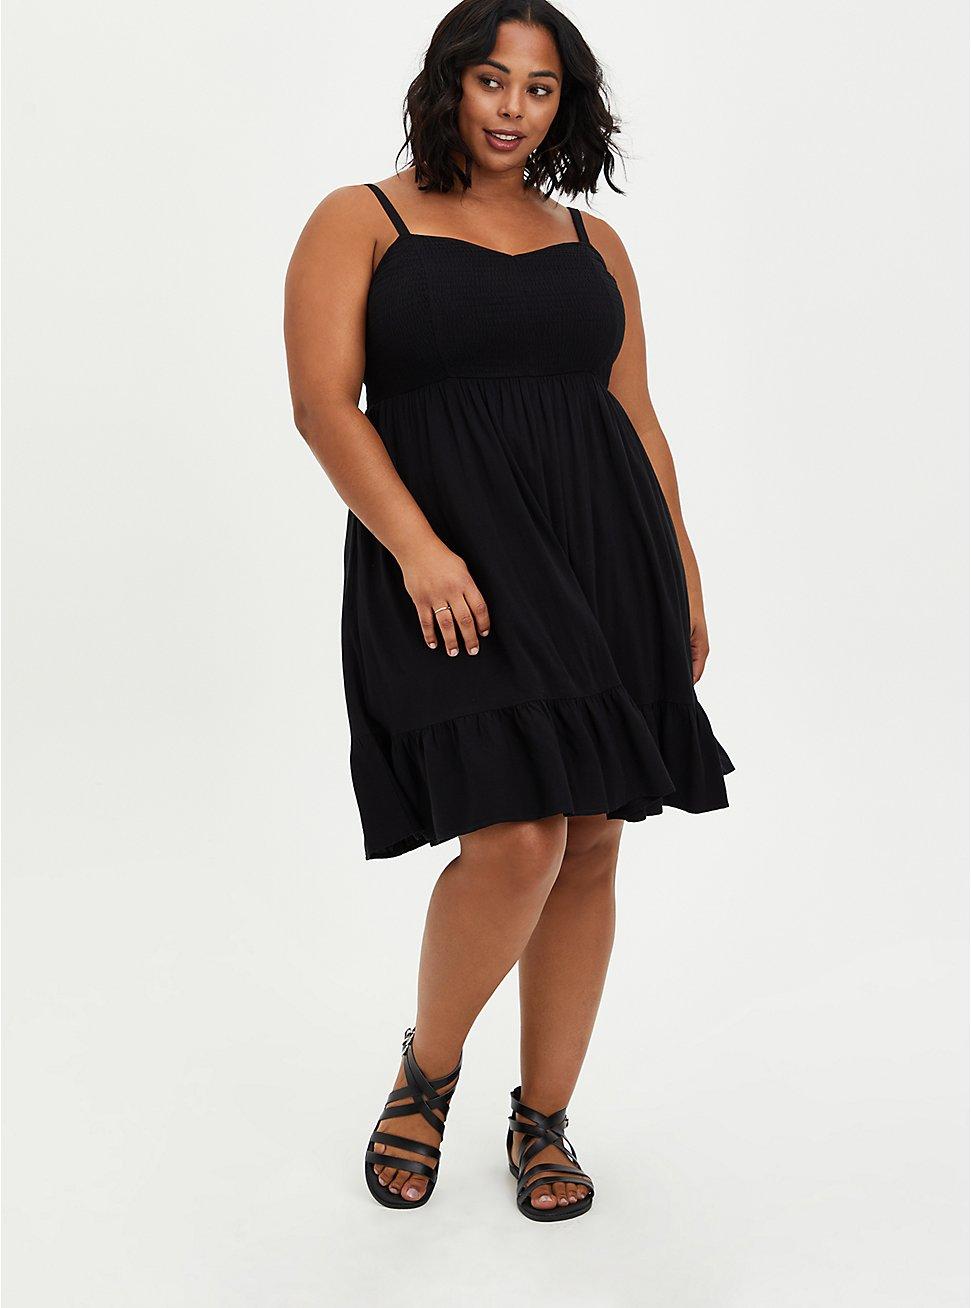 Black Textured Stretch Rayon Smocked Skater Dress, DEEP BLACK, hi-res